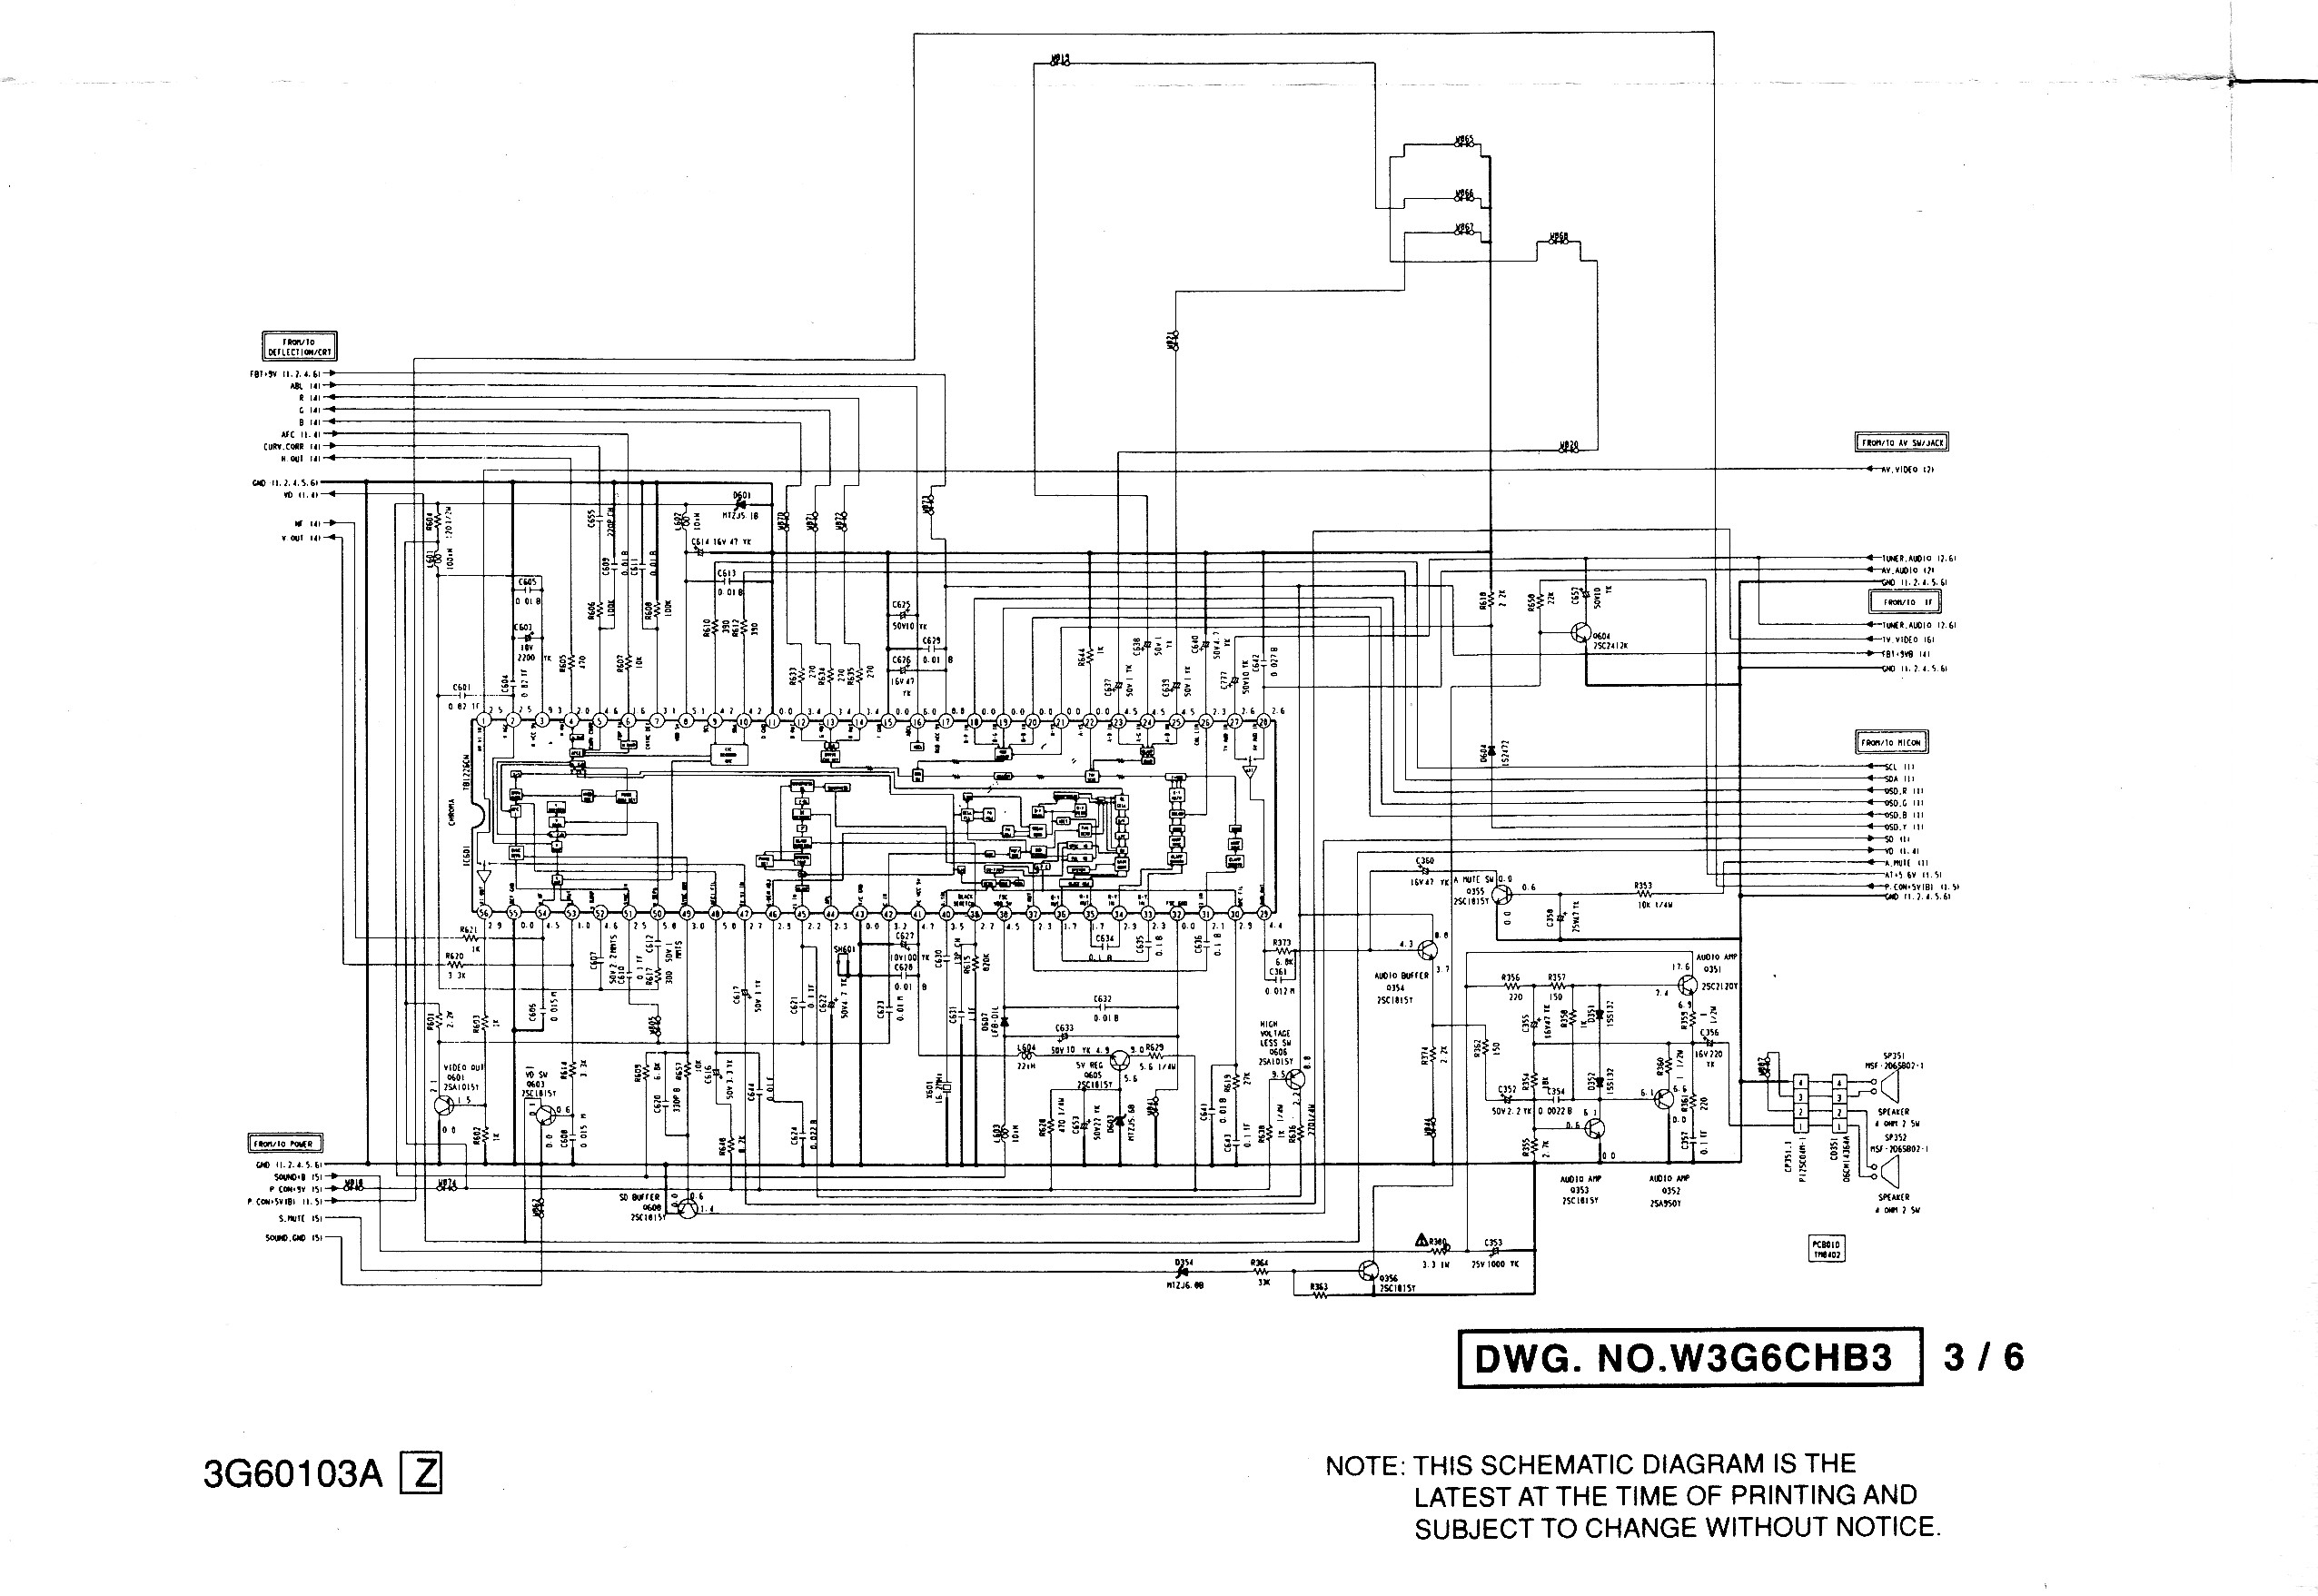 h схему телевизора chassis